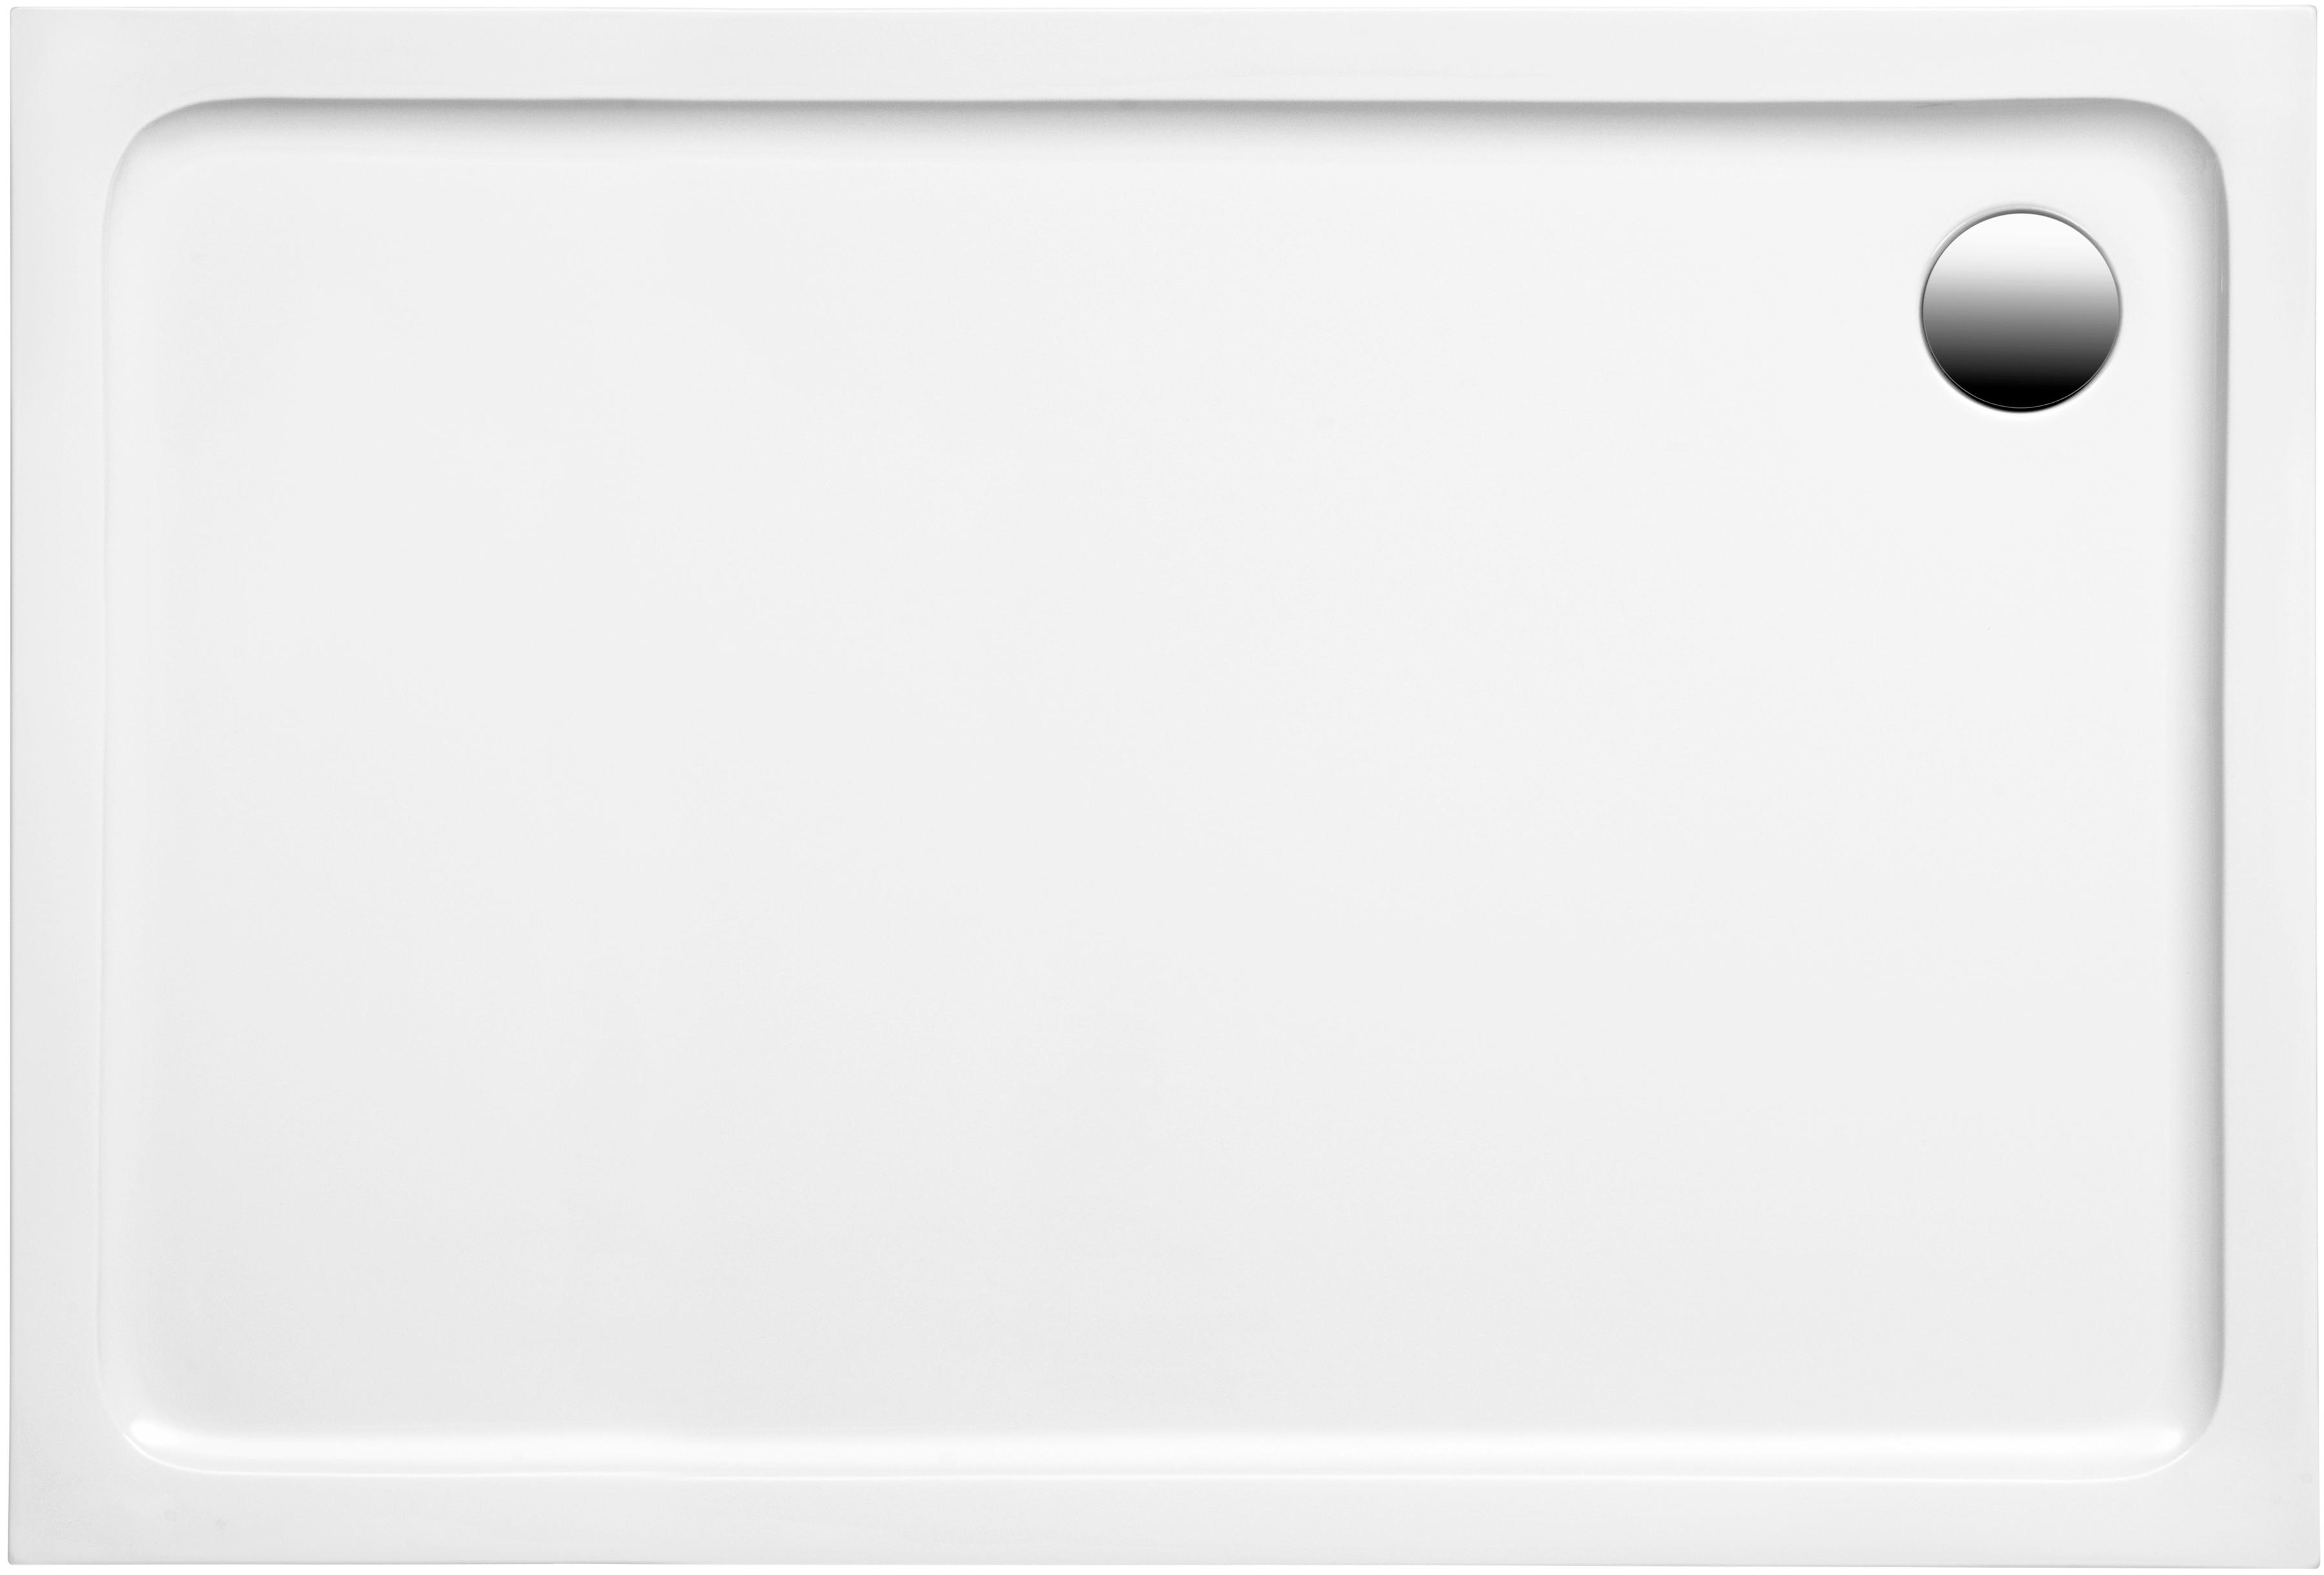 OTTOFOND Duschwanne Set Rechteckduschwanne, 1200x800/30 mm weiß Duschwannen Duschen Bad Sanitär